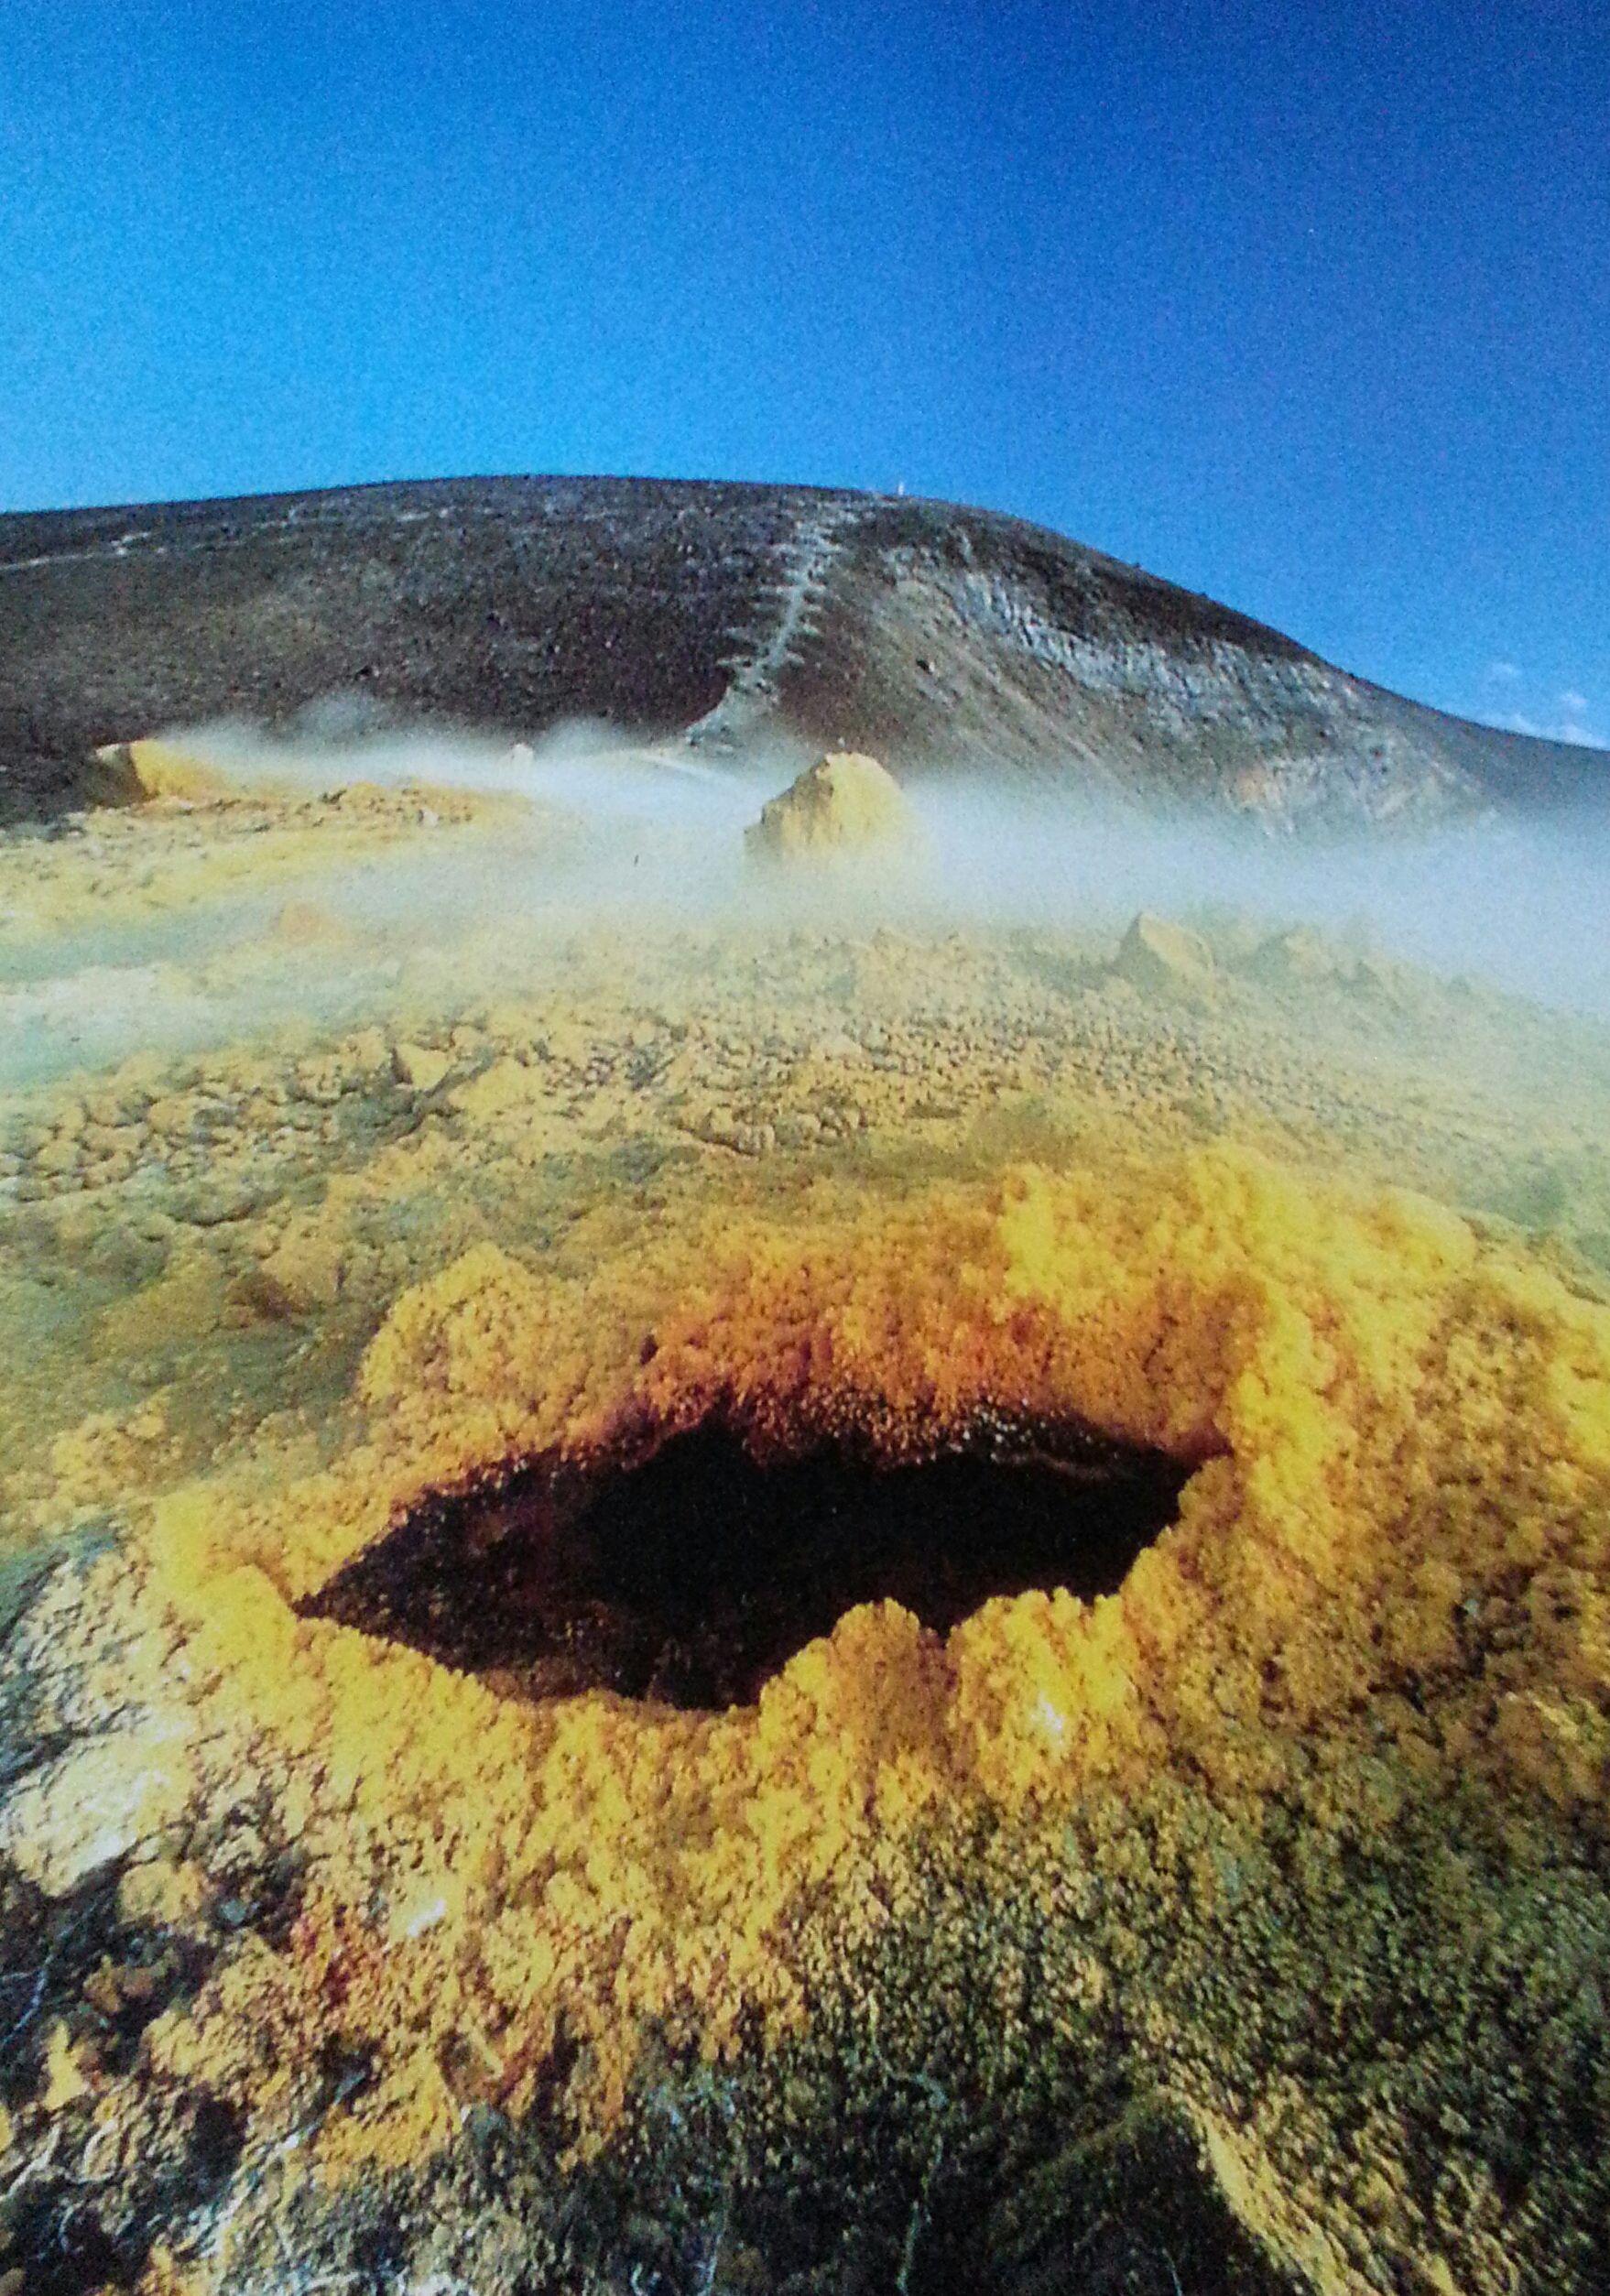 Bocca sulfurea du volcan de l'Ile de Vulcano (au nord de la Sicile)